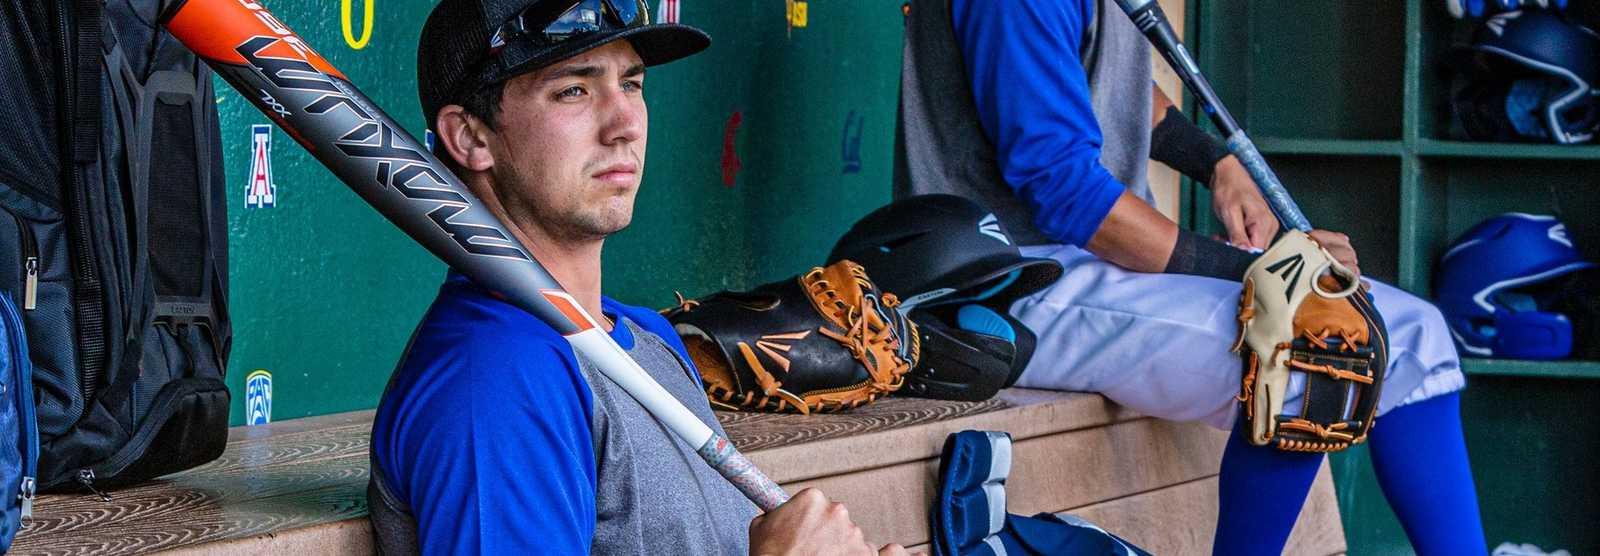 baseball-softball-sunglasses